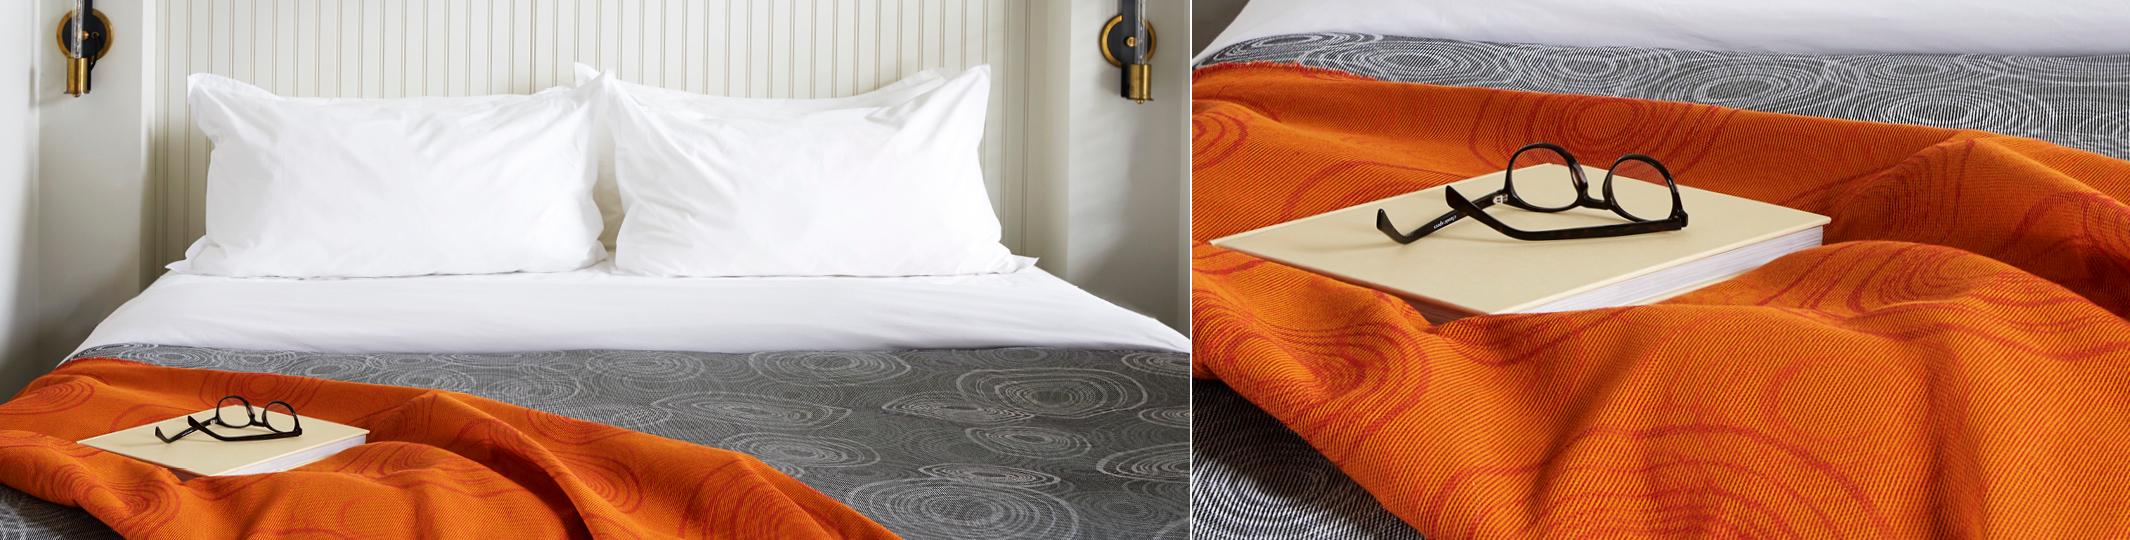 Ilorom Luxury Fabrics - Media